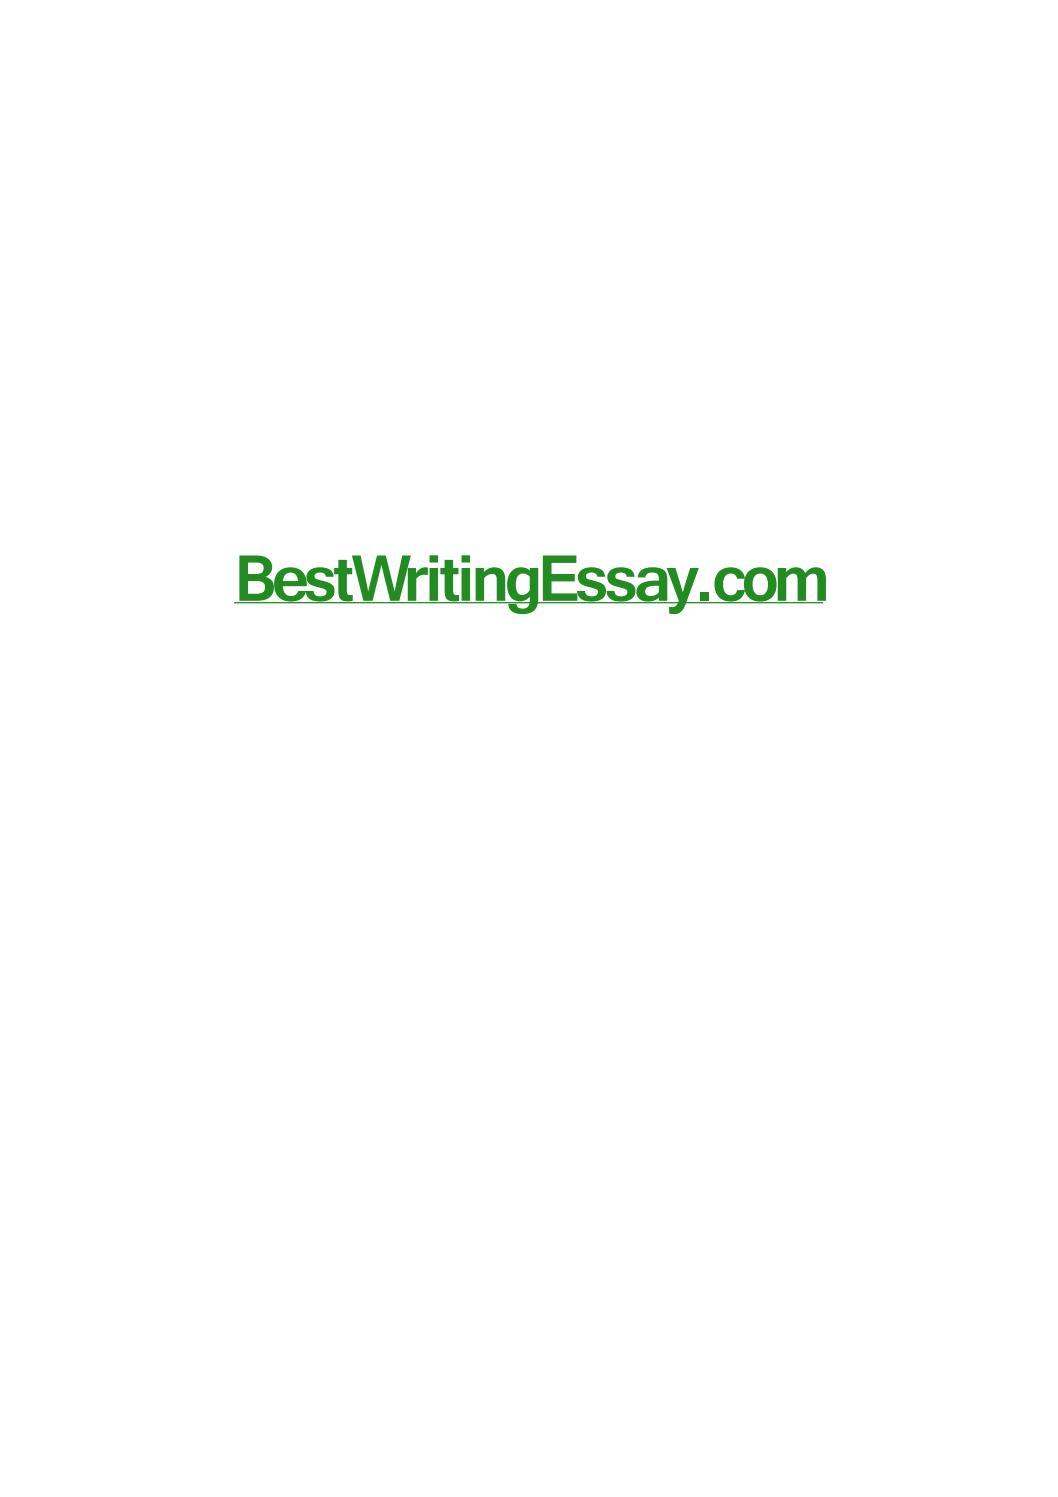 Dissertation helps people start